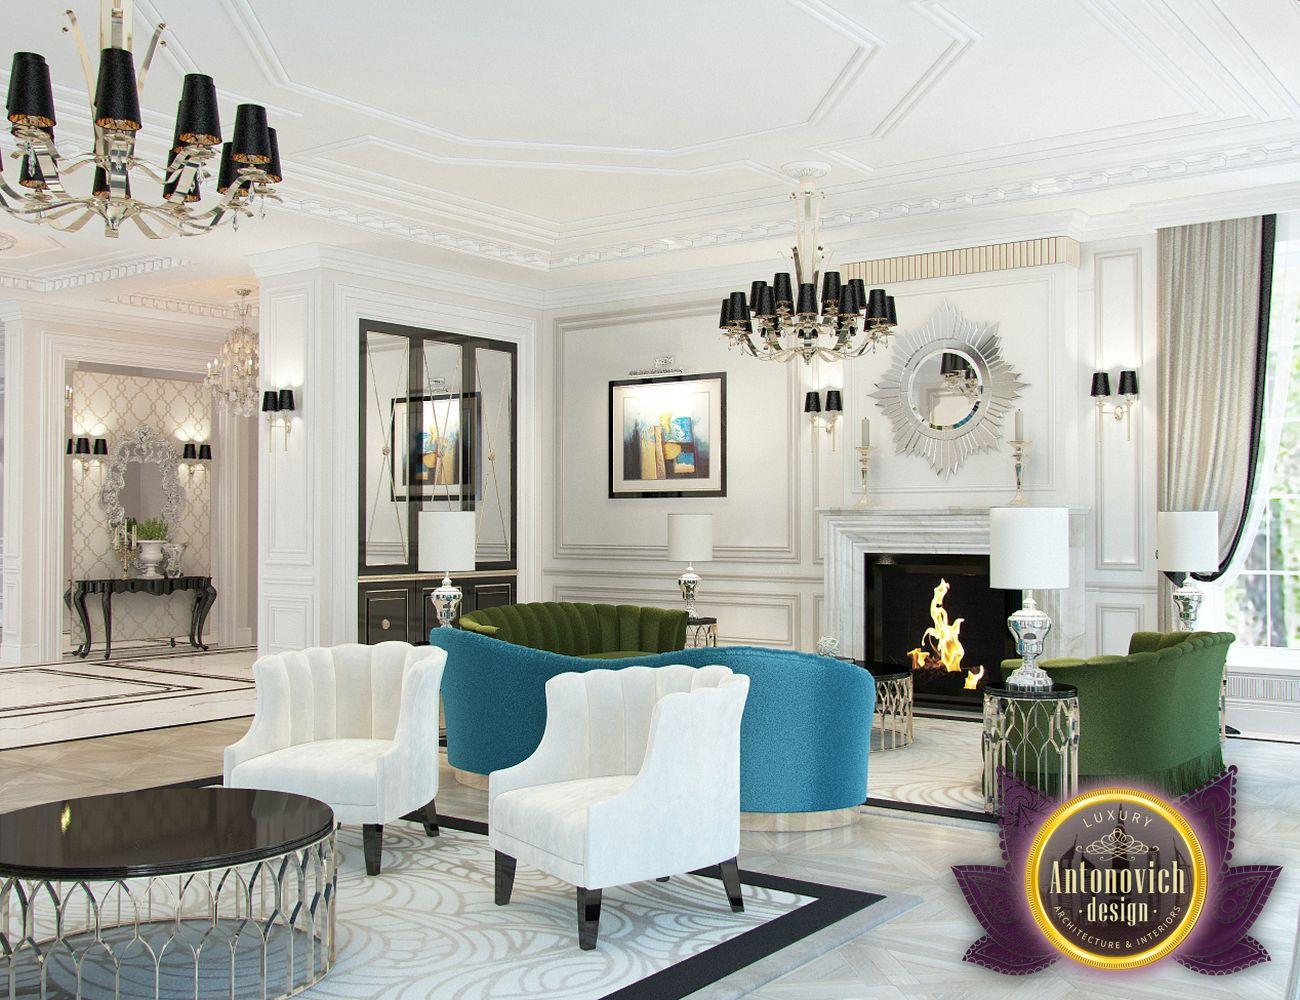 Nigeiradesign the house interior design in nigeria from for Home interior designs in nigeria